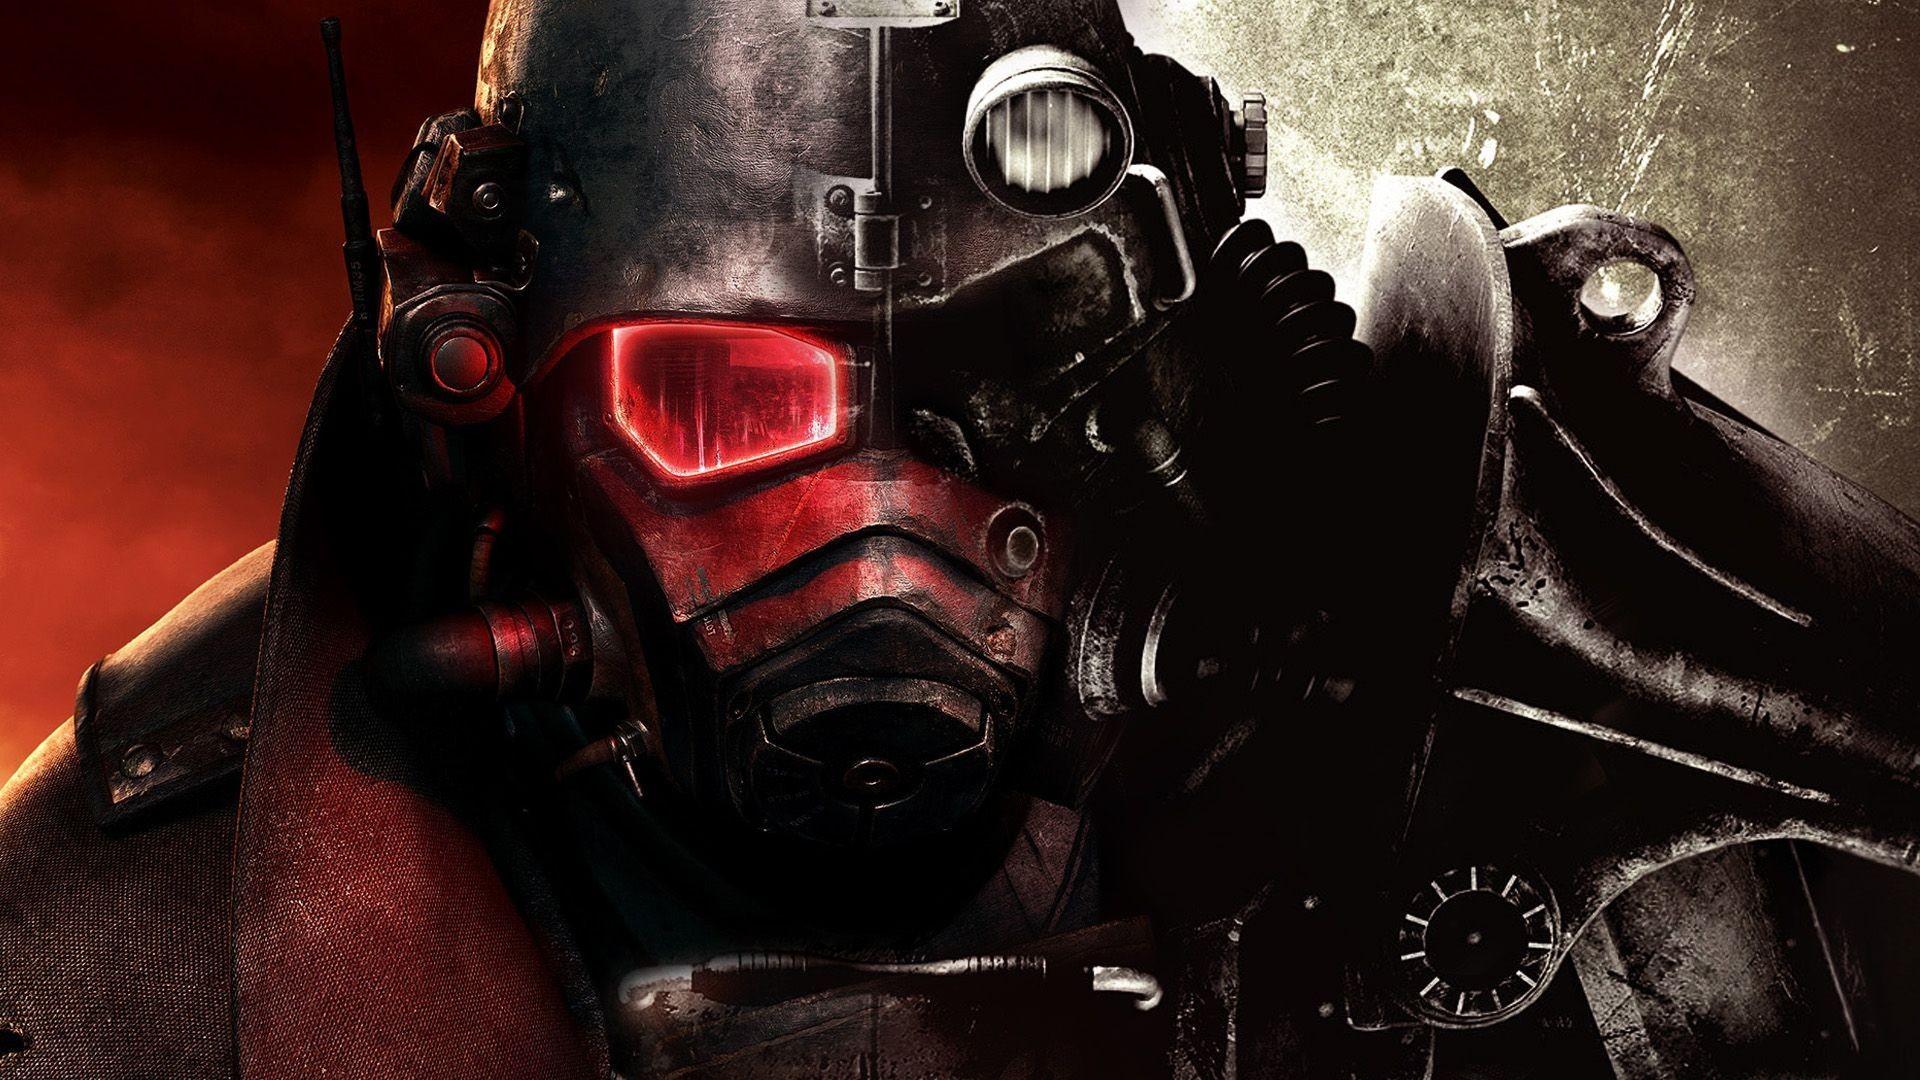 Fallout porb pics porn pic